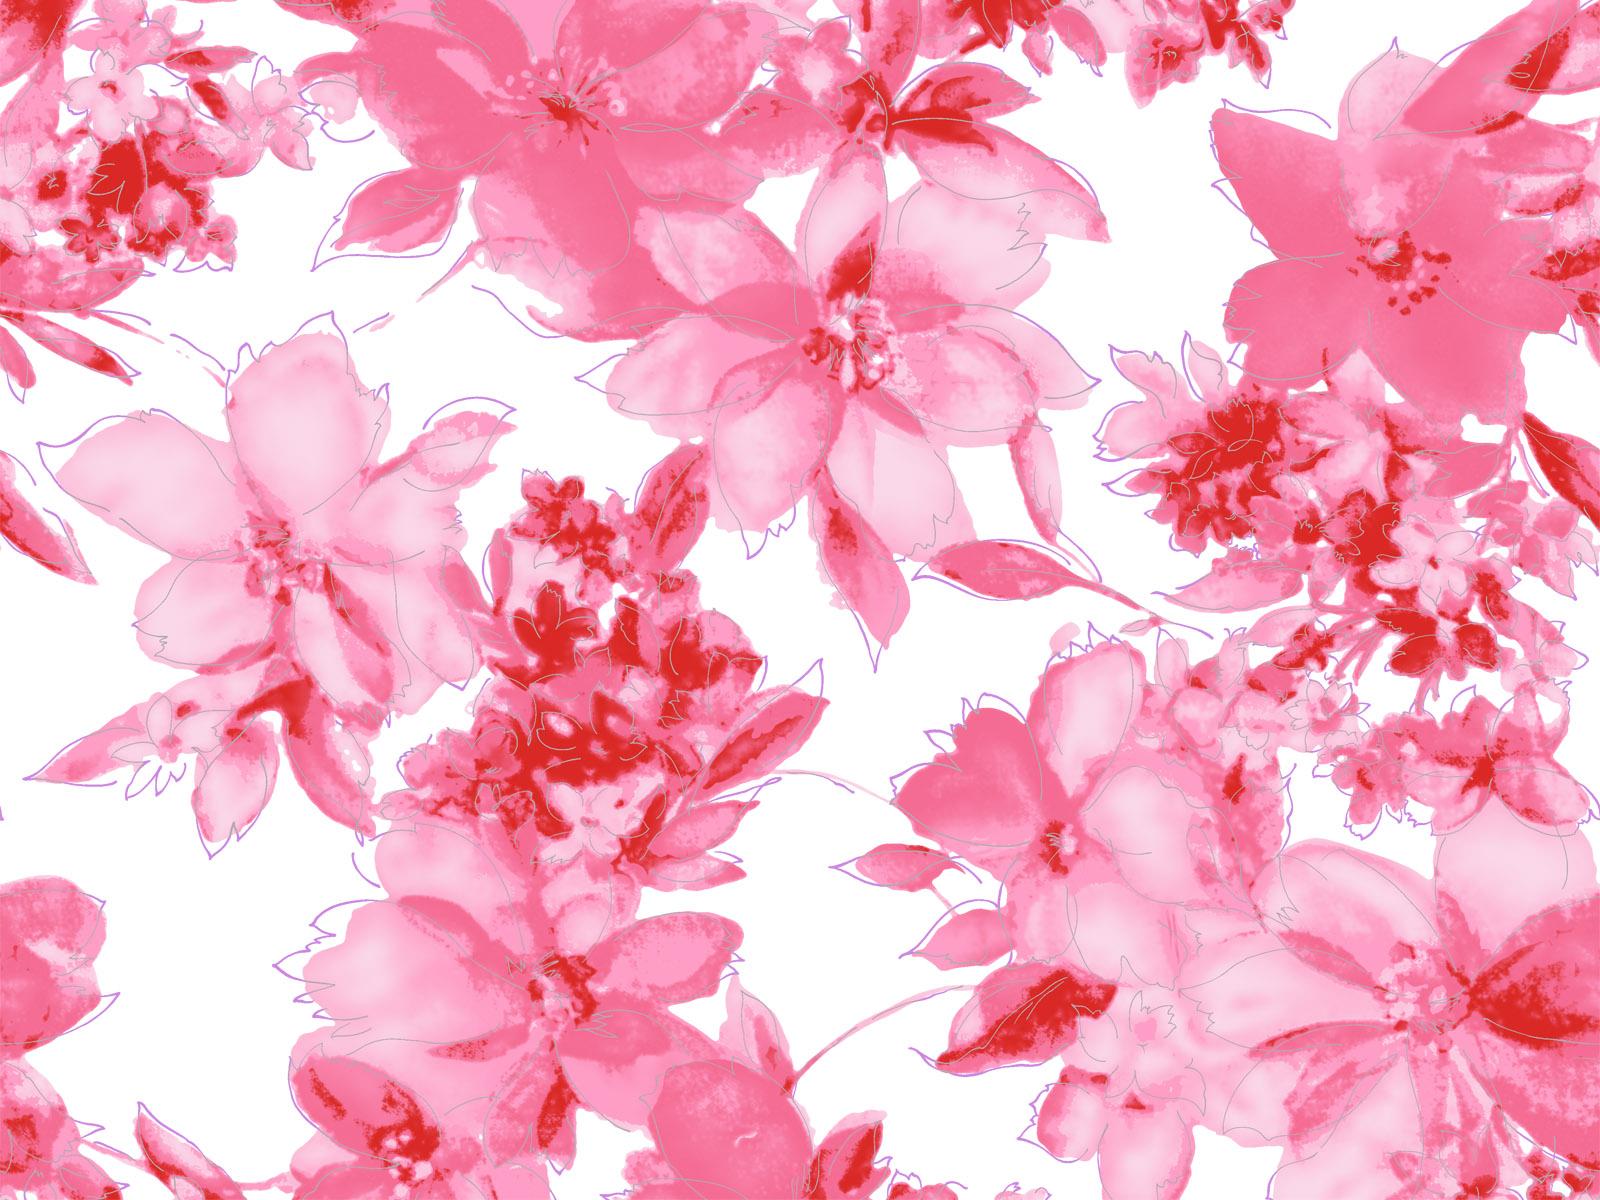 Free pink flower wallpaper wallpapersafari flowers wallpaper glow flowers wallpaper beautiful rosses wallpaper 1600x1200 mightylinksfo